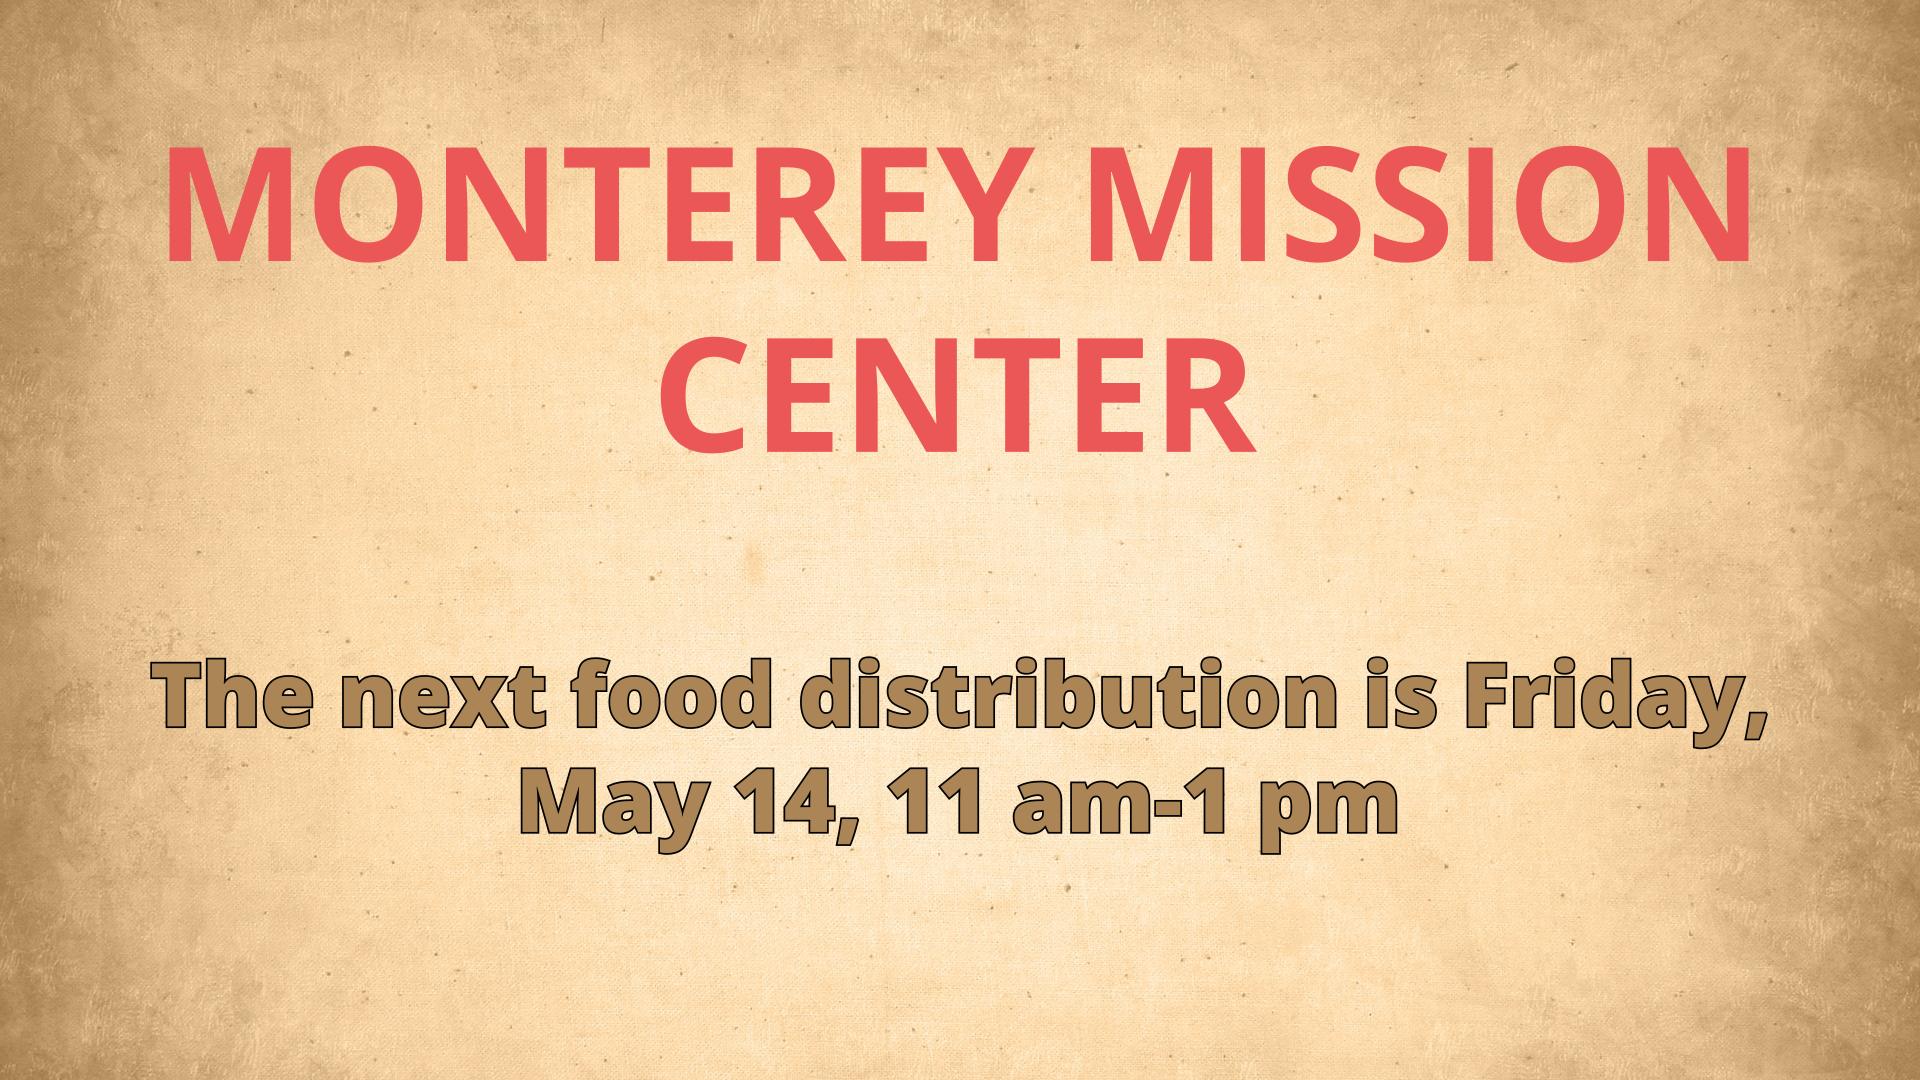 MONTEREY MISSION CENTER - Food Distribution